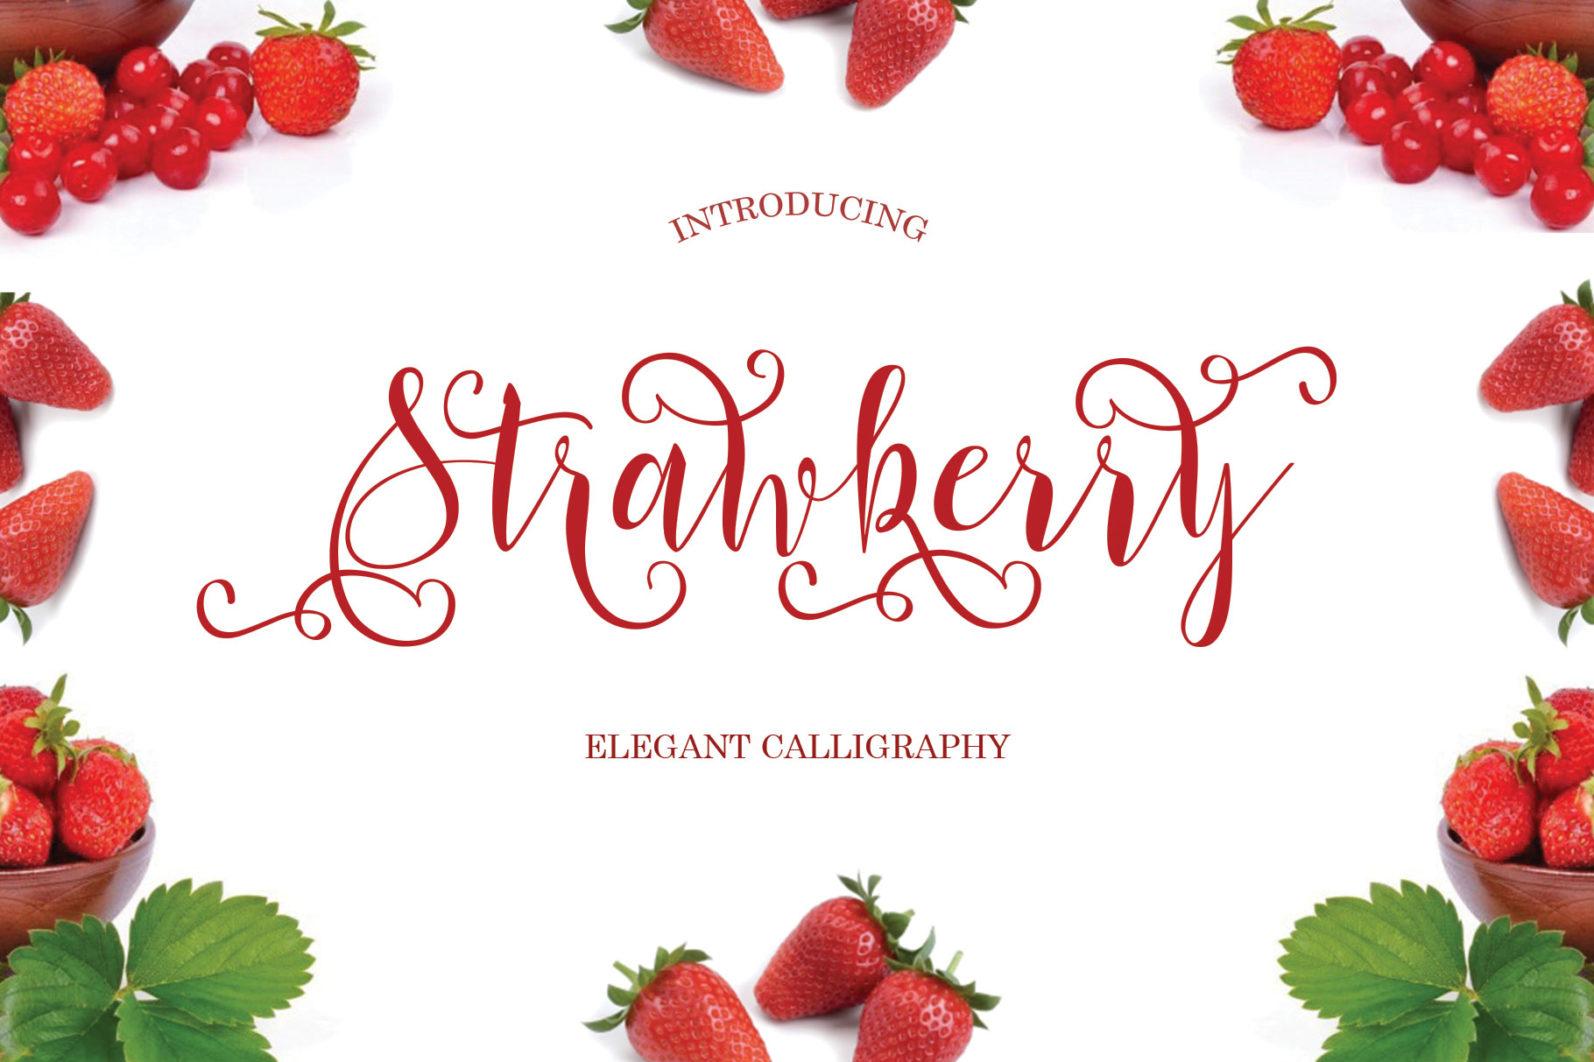 Strawberry - Image6 1 -